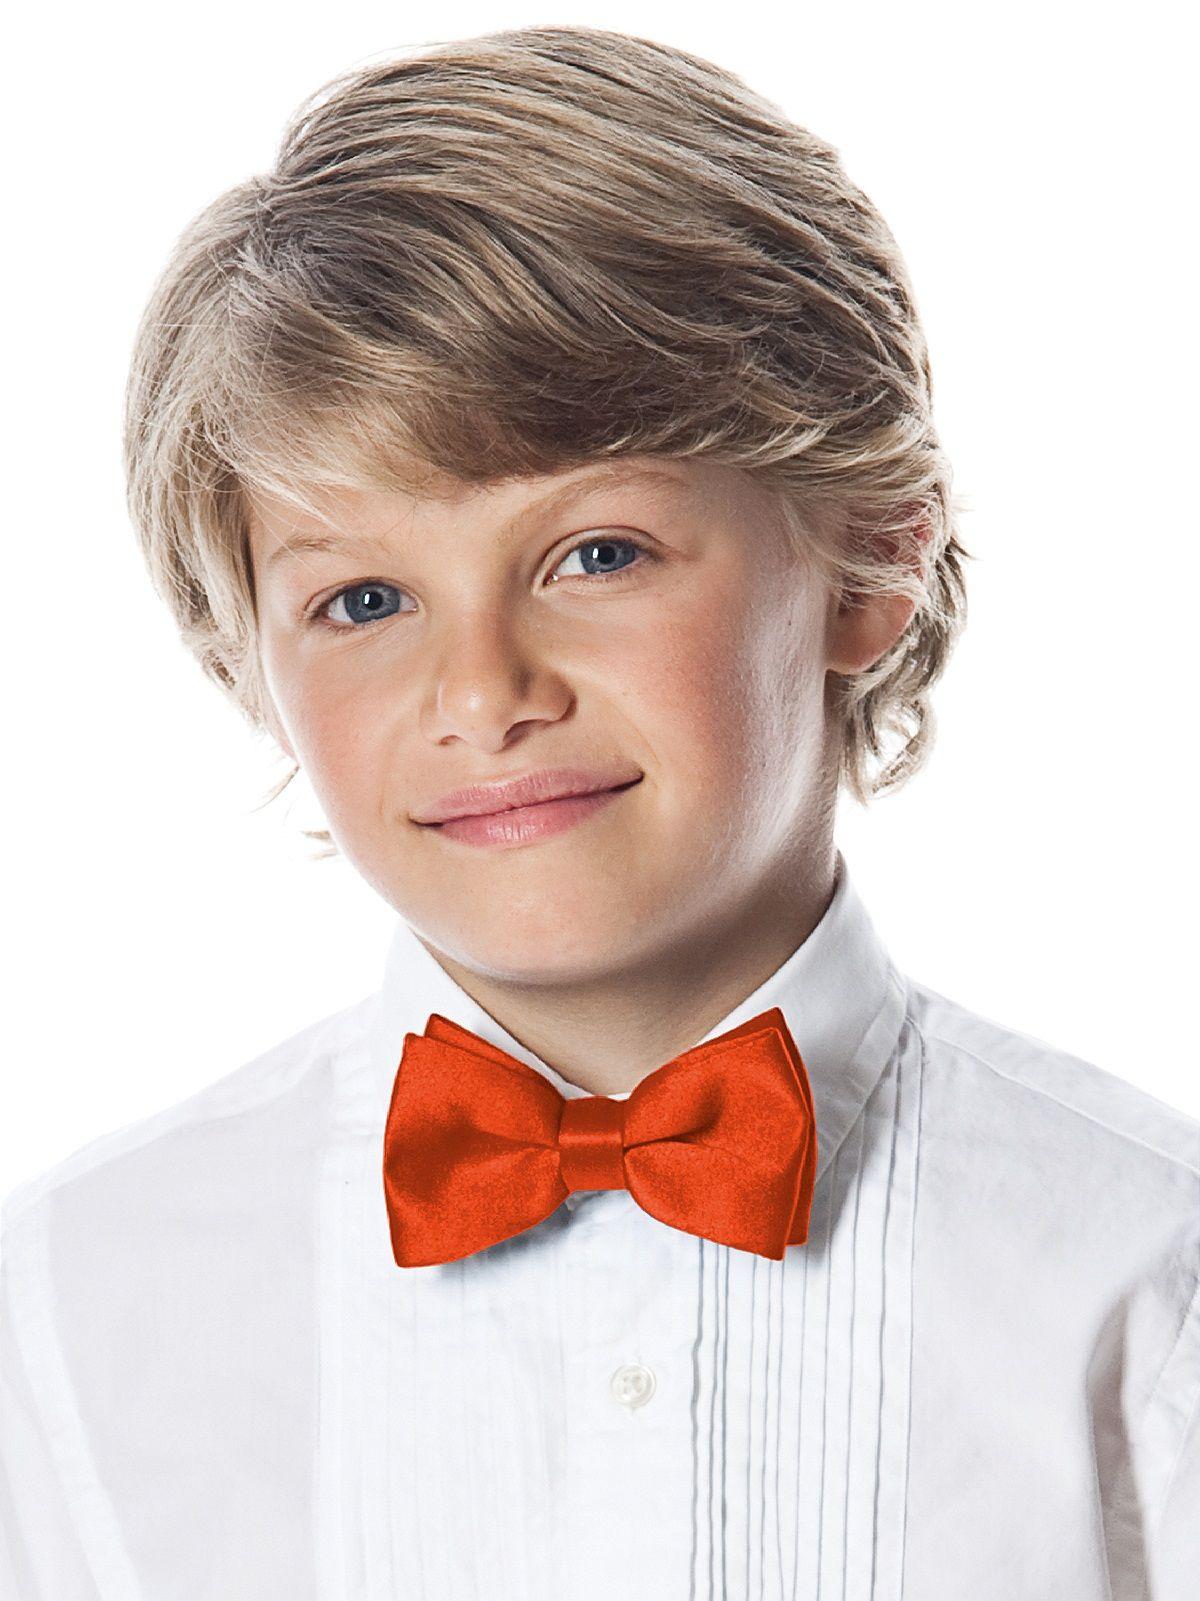 Boy's Clip Bow Tie in Duchess Satin http://www.dessy.com/accessories/boys-clip-duchess-bow-tie/ - $6 from Dessy